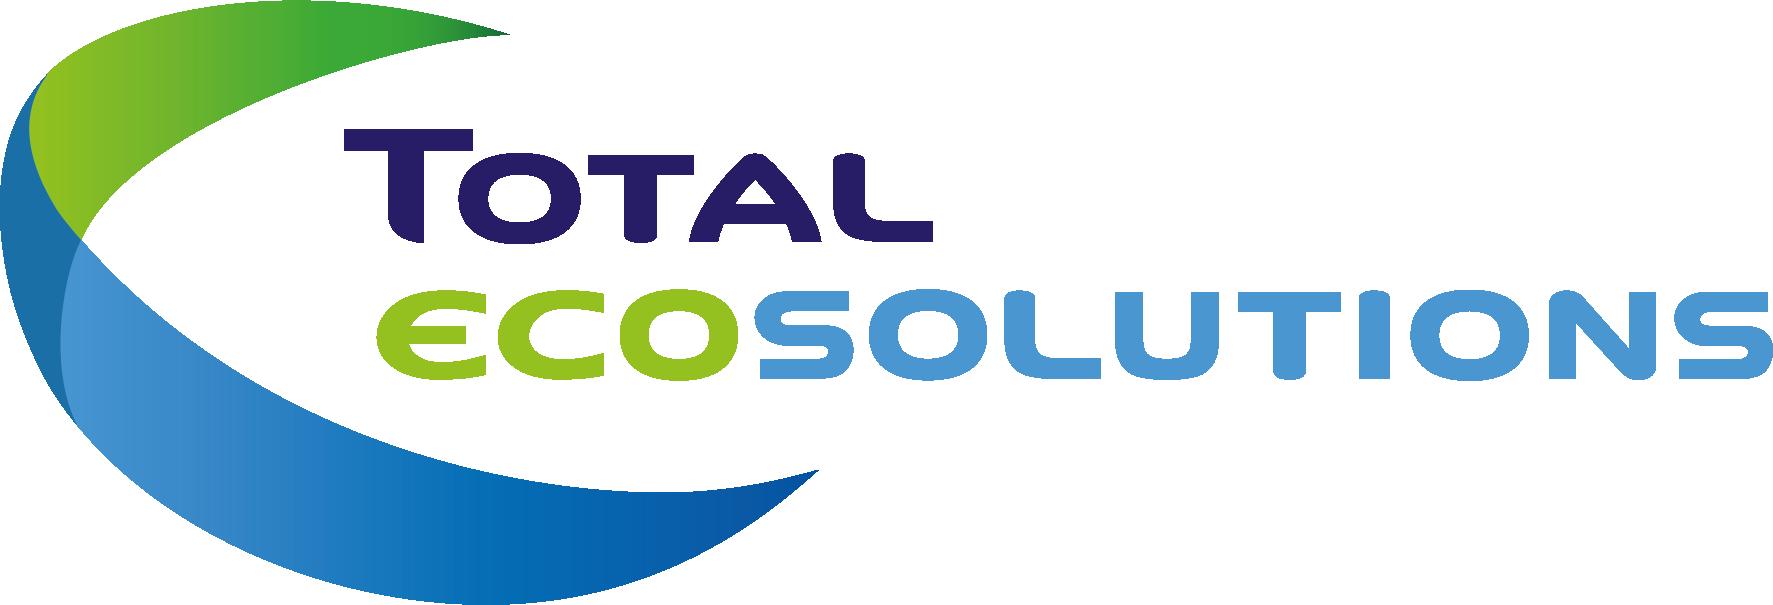 Ecosolutions